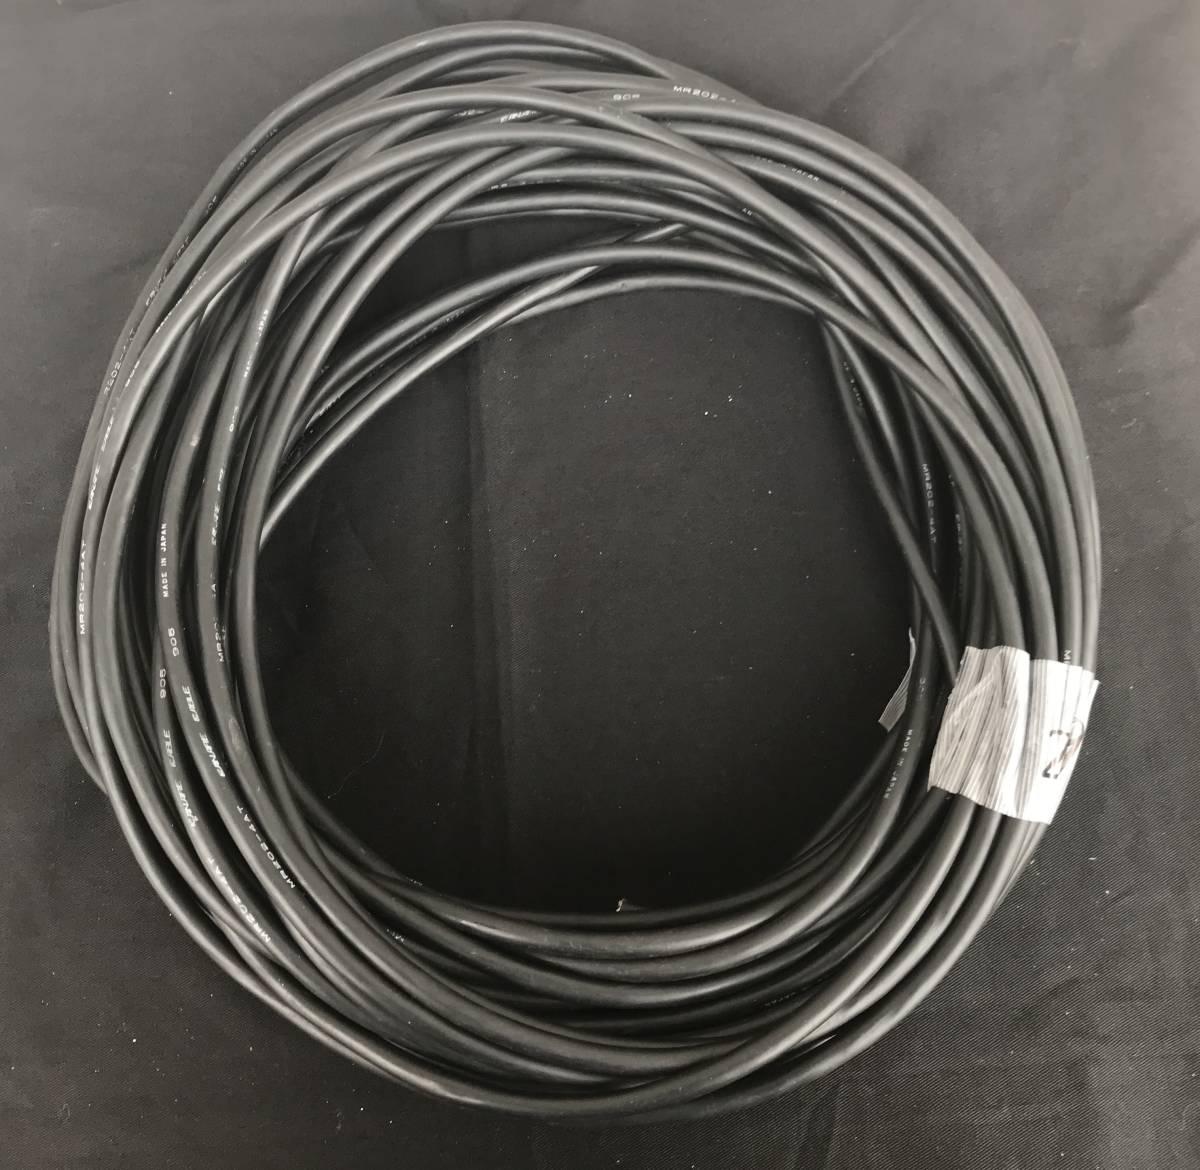 CANARE(カナレ) MR202-4AT(905) 黒 約29m39cm 中古品